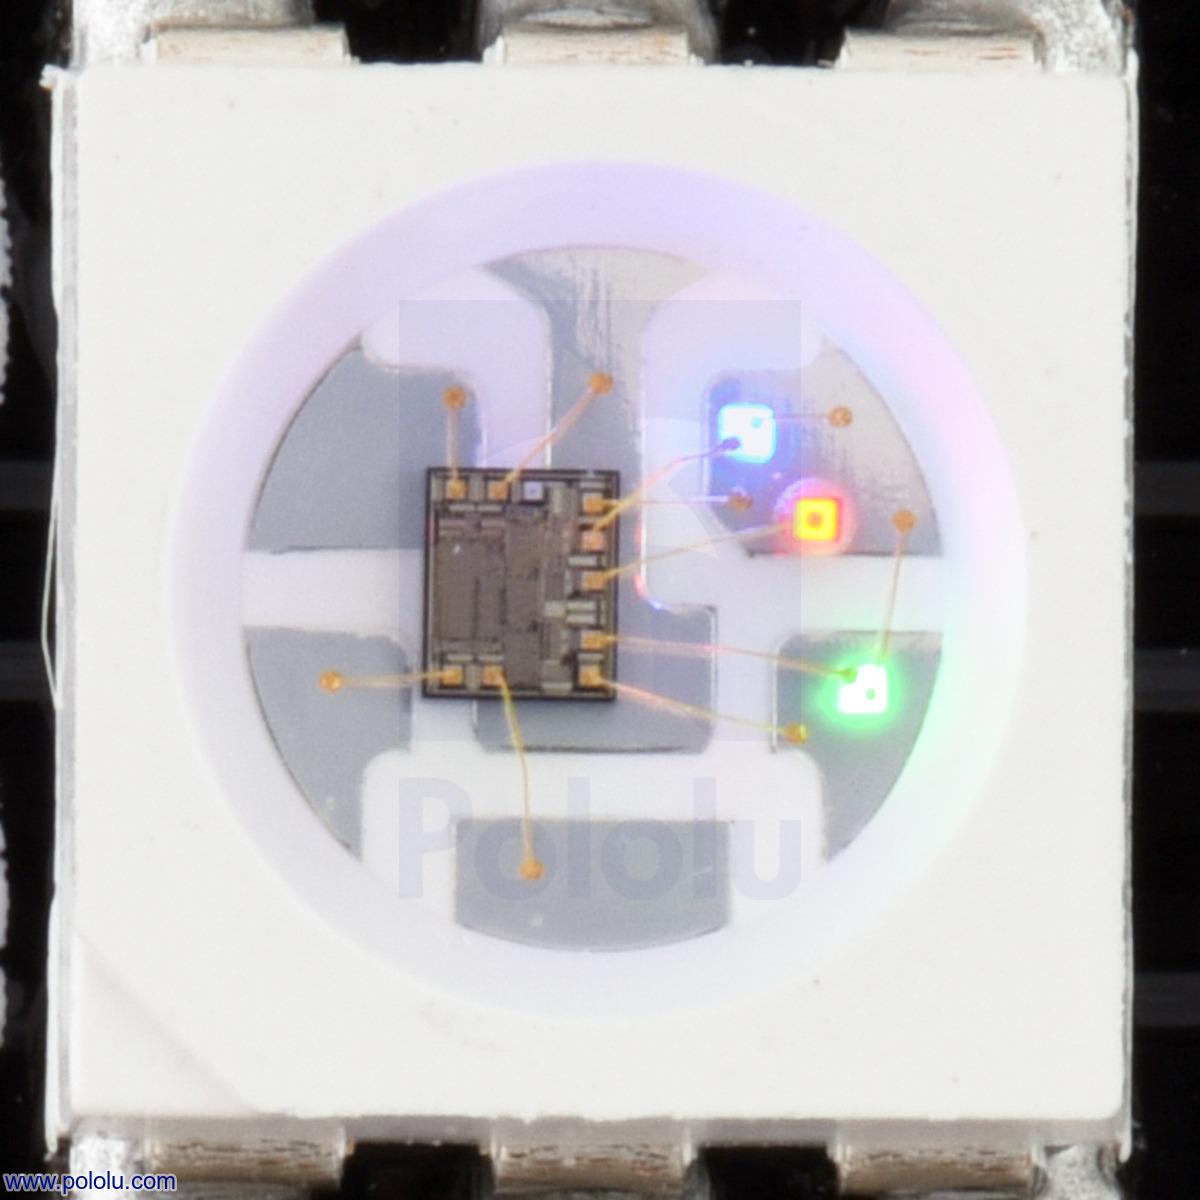 Pololu - Addressable RGB 8x32-LED Flexible Panel, 5V, 10mm Grid